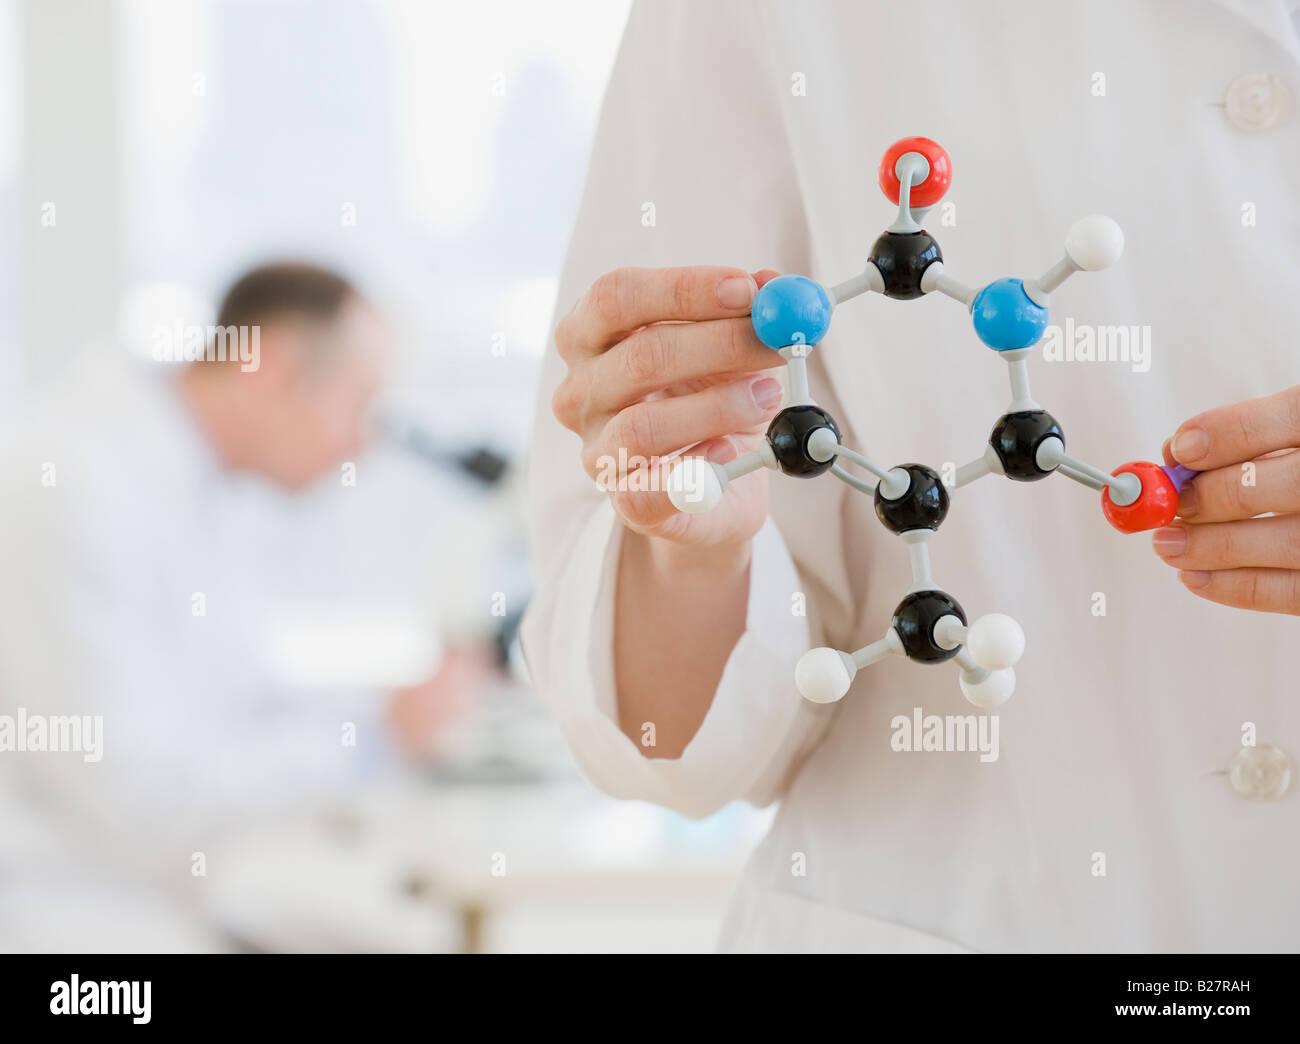 Female scientist holding molecular model - Stock Image